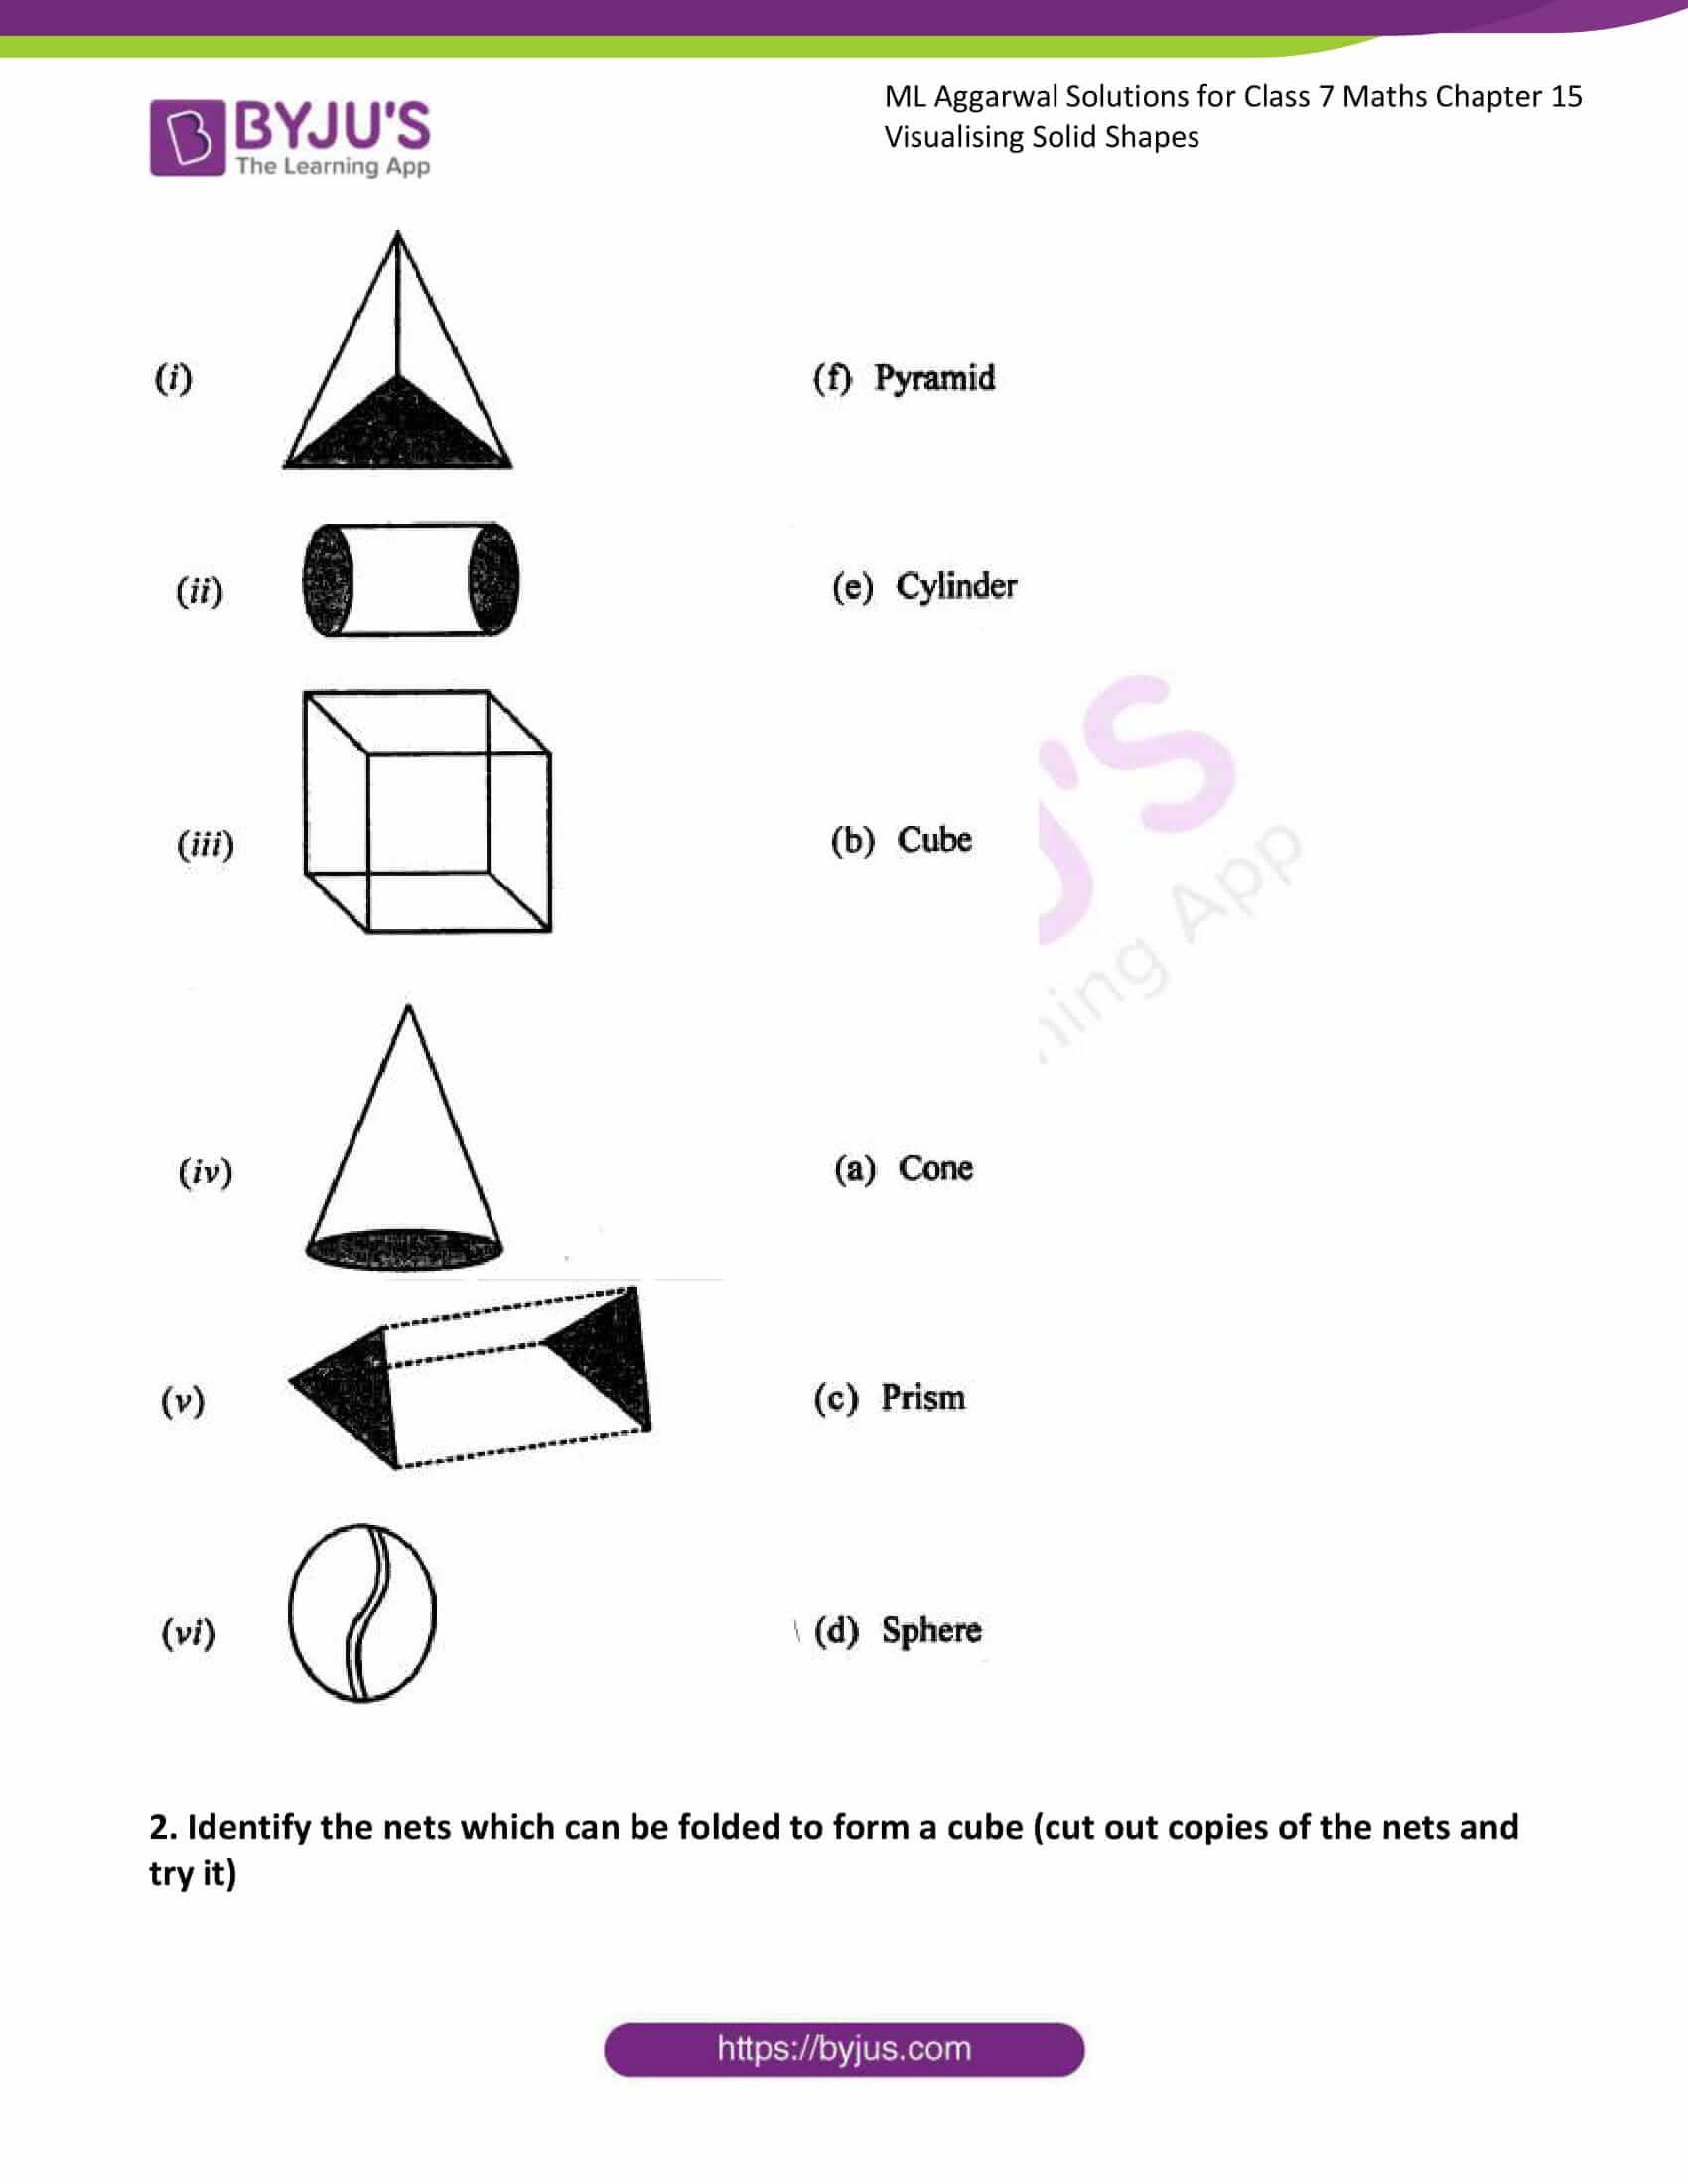 ml aggarwal sol class 7 maths chapter 15 2